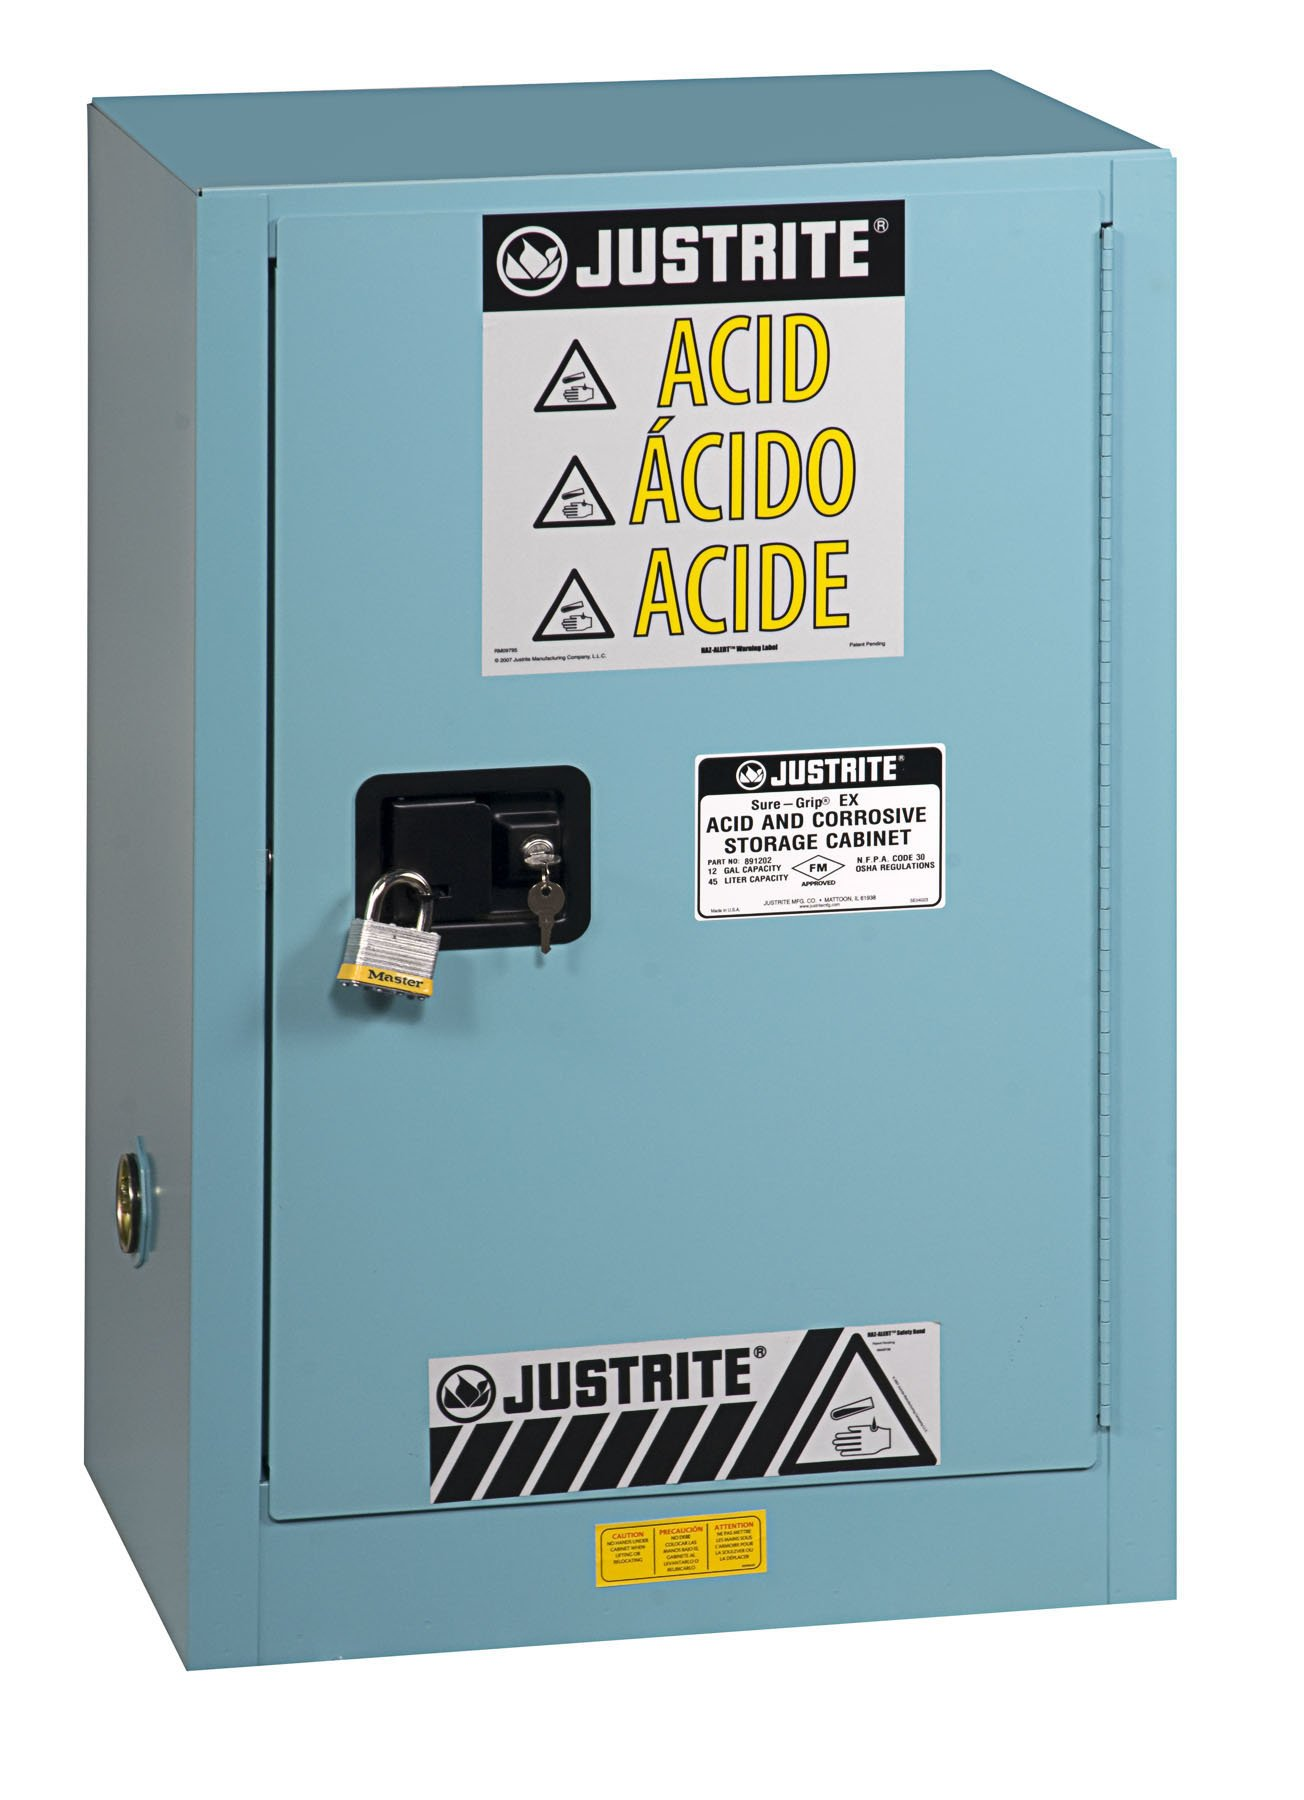 Justrite 891222 Sure-Grip EX Galvanized Steel 1 Door Self Close Compac Corrosives Safety Storage Cabinet, 12 Gallon Capacity, 23-1/4'' Width x 35'' Height x 18'' Depth, 1 Adjustable Shelfs, Blue